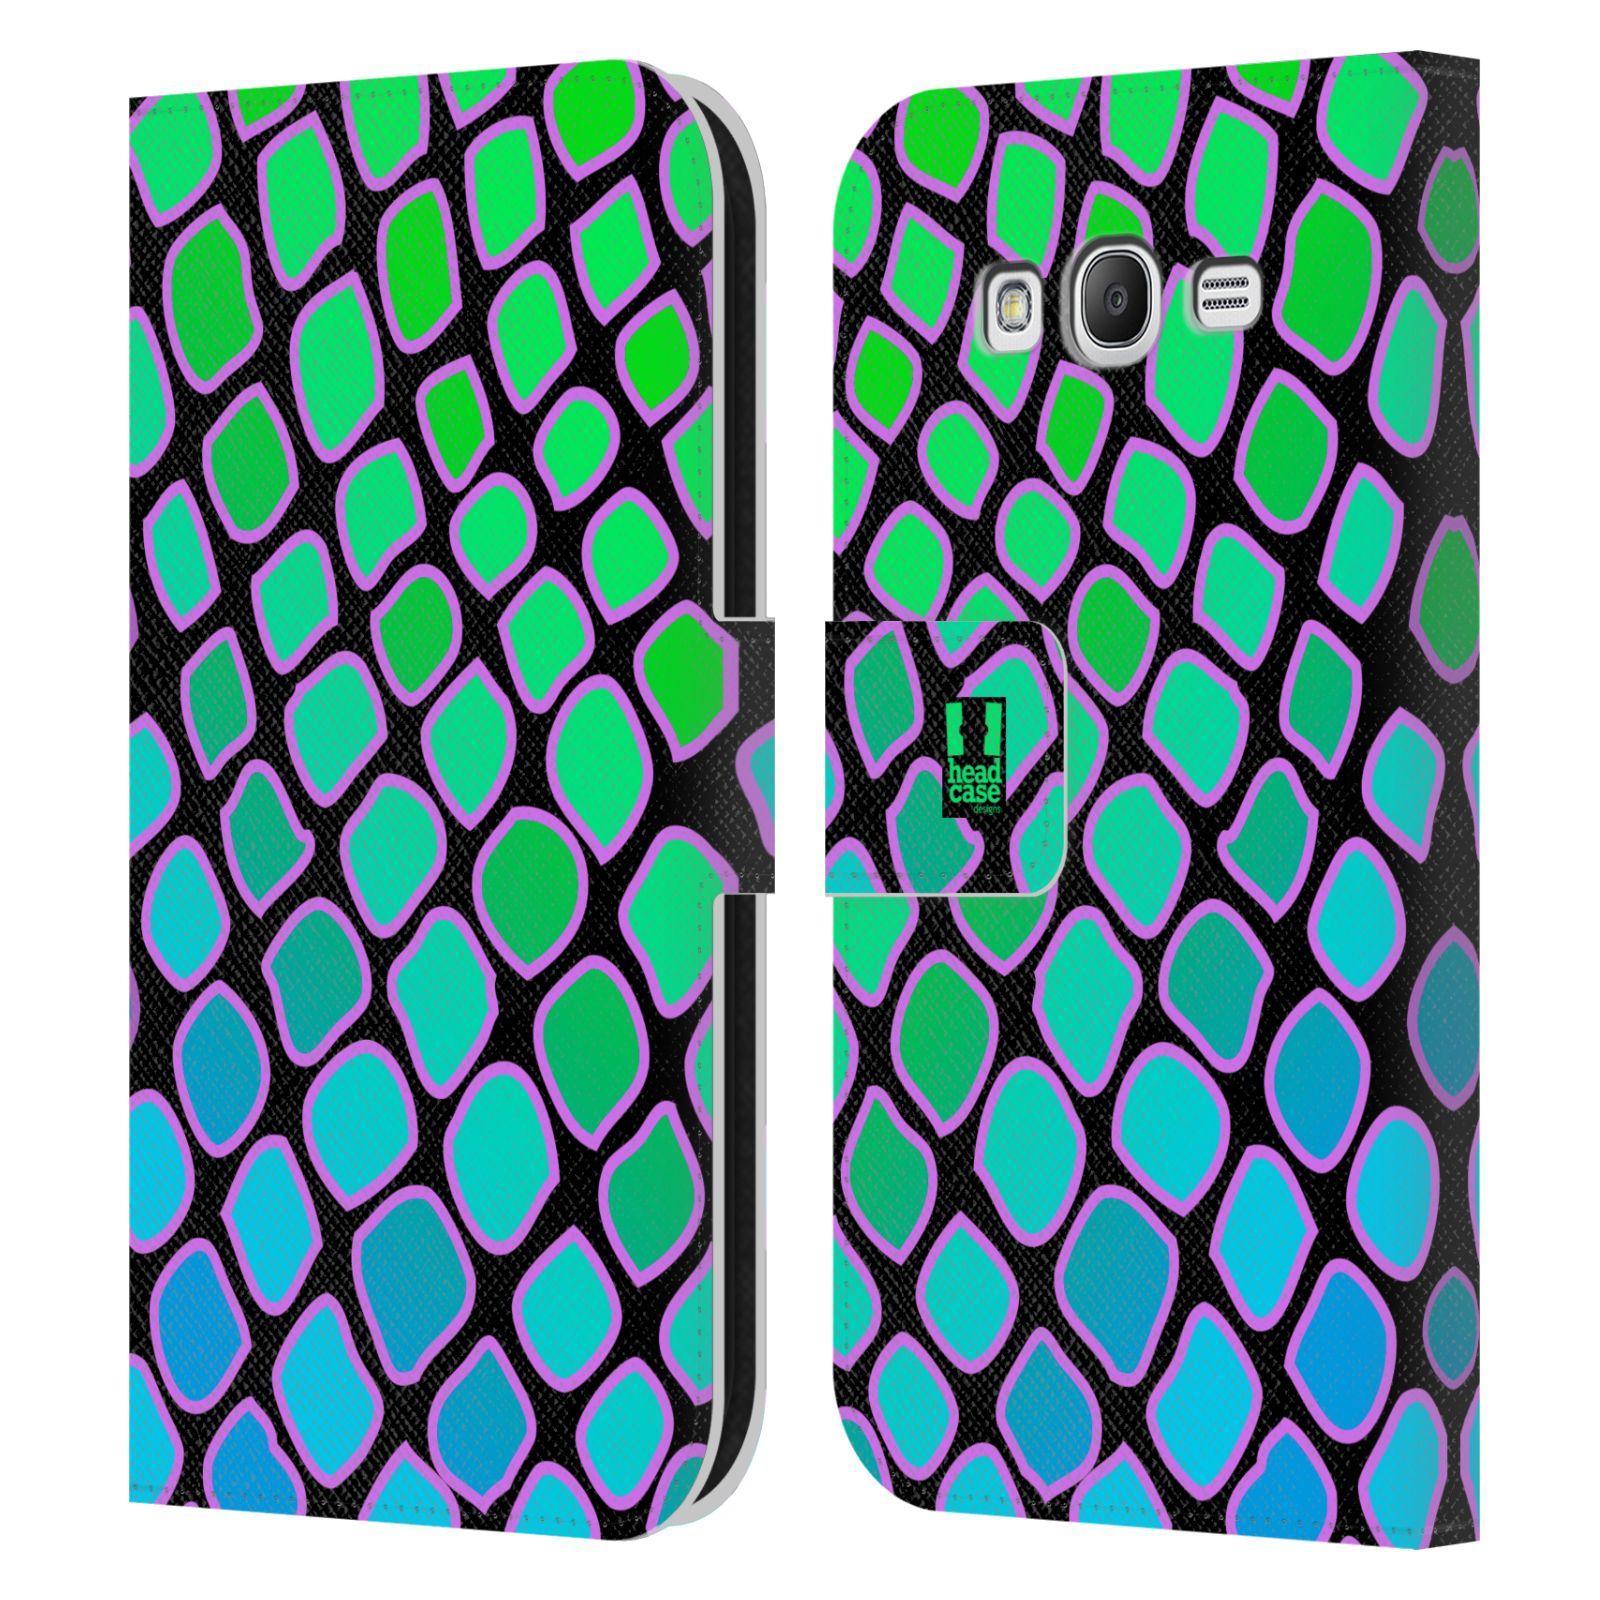 HEAD CASE Flipové pouzdro pro mobil Samsung Galaxy Grand i9080 Zvířecí barevné vzory vodní had modrá a zelená barva AQUA